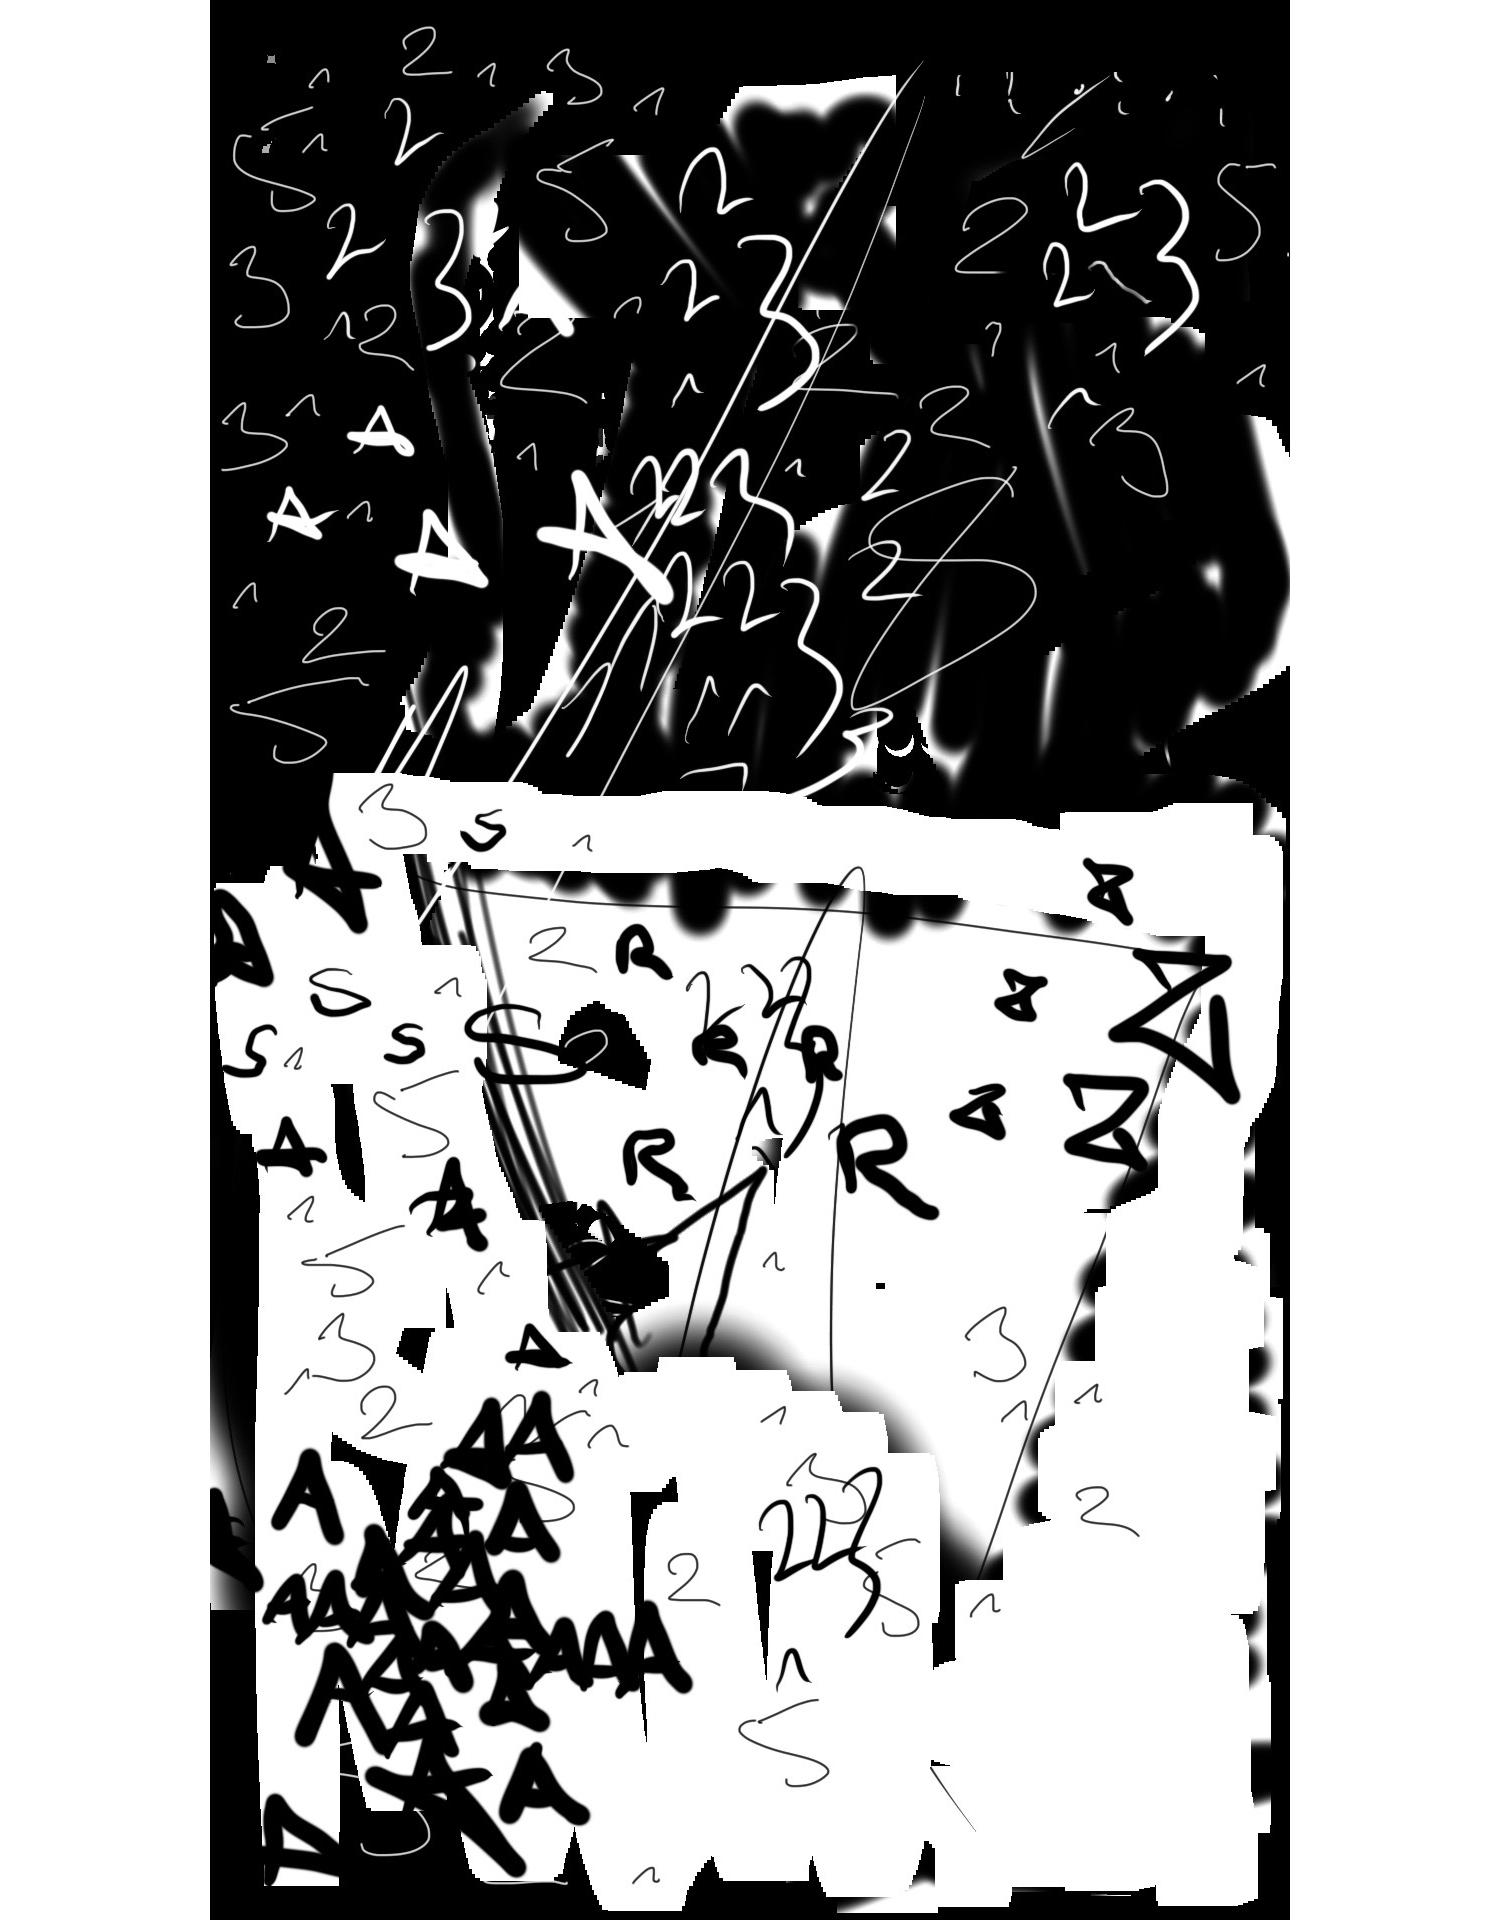 CO126 GAU THE BEAUTIFUL FORMULA COLLECTIVE Daniel Geiger, Oleksiy Koval, Veronika Wenger Digital painting